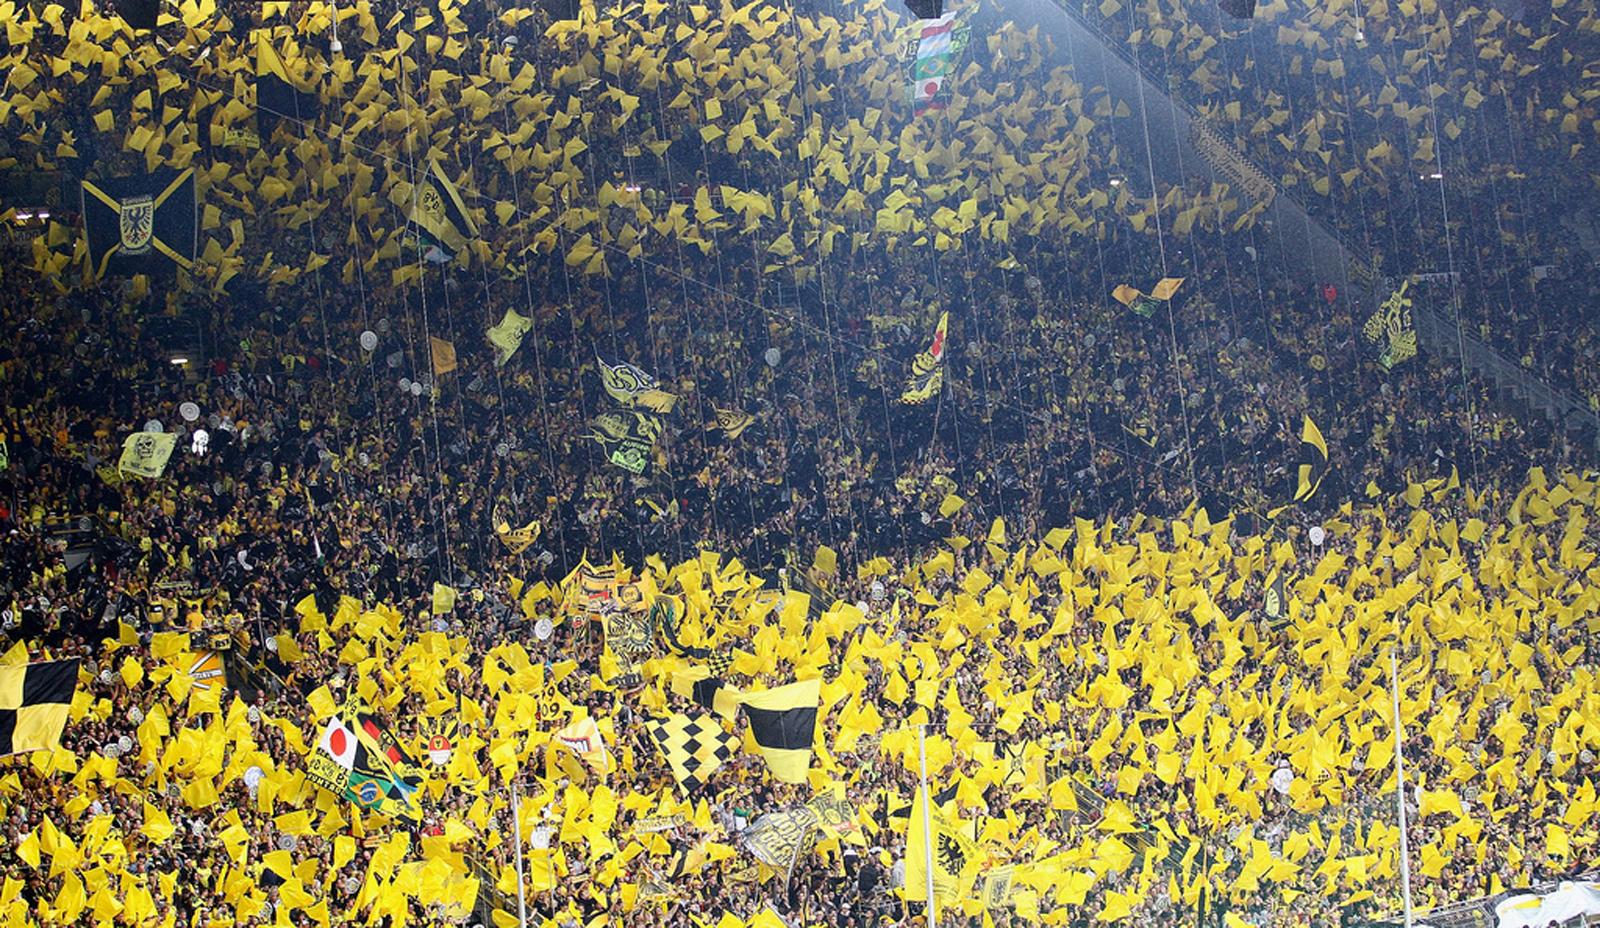 12-11-19_KS_Dortmund_07_Ausschnitt